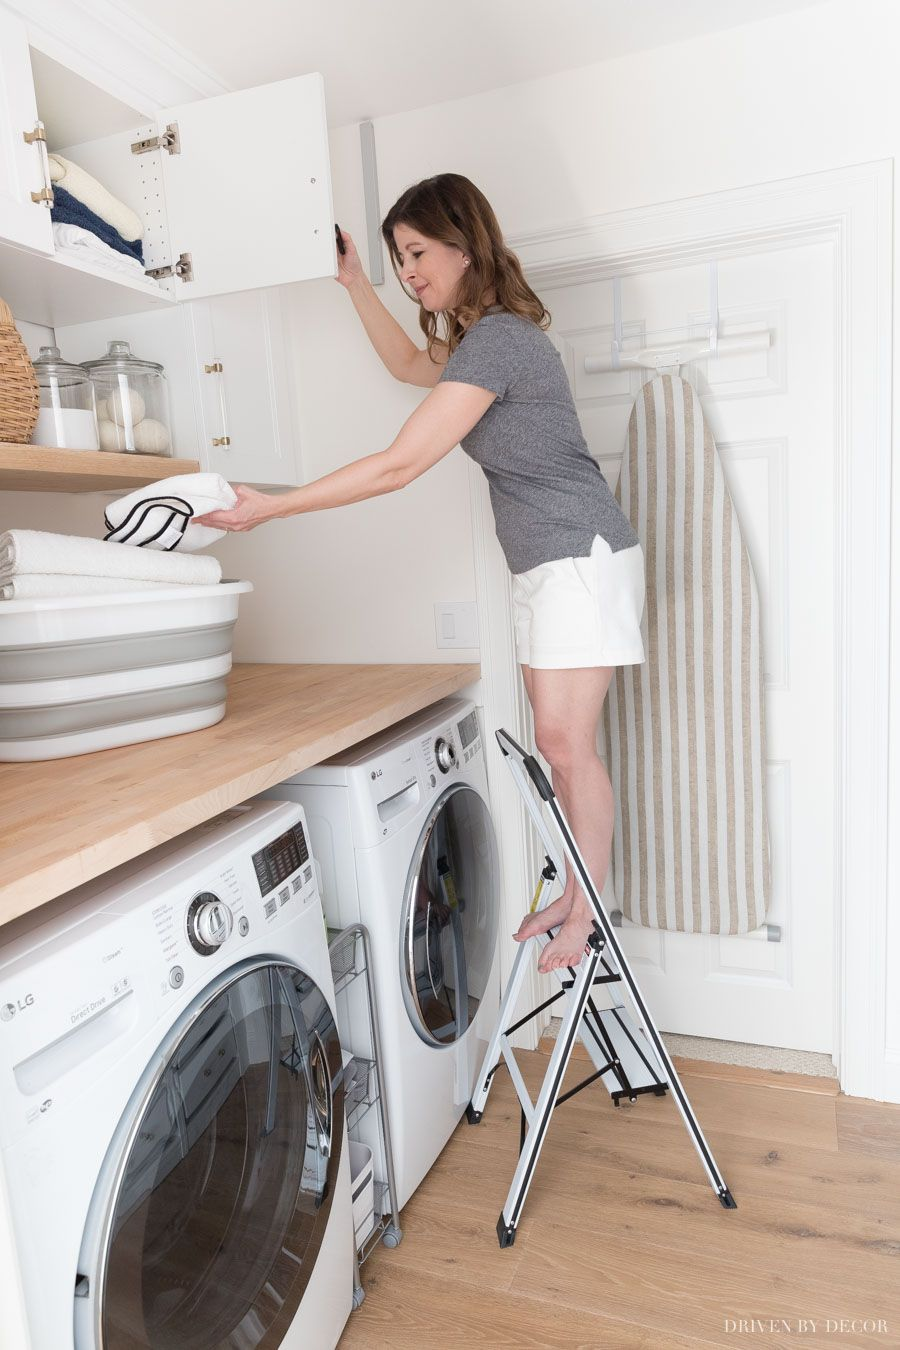 My Six Best Laundry Room Storage Ideas Driven By Decor Laundry Room Storage Storage Room Laundry Decor